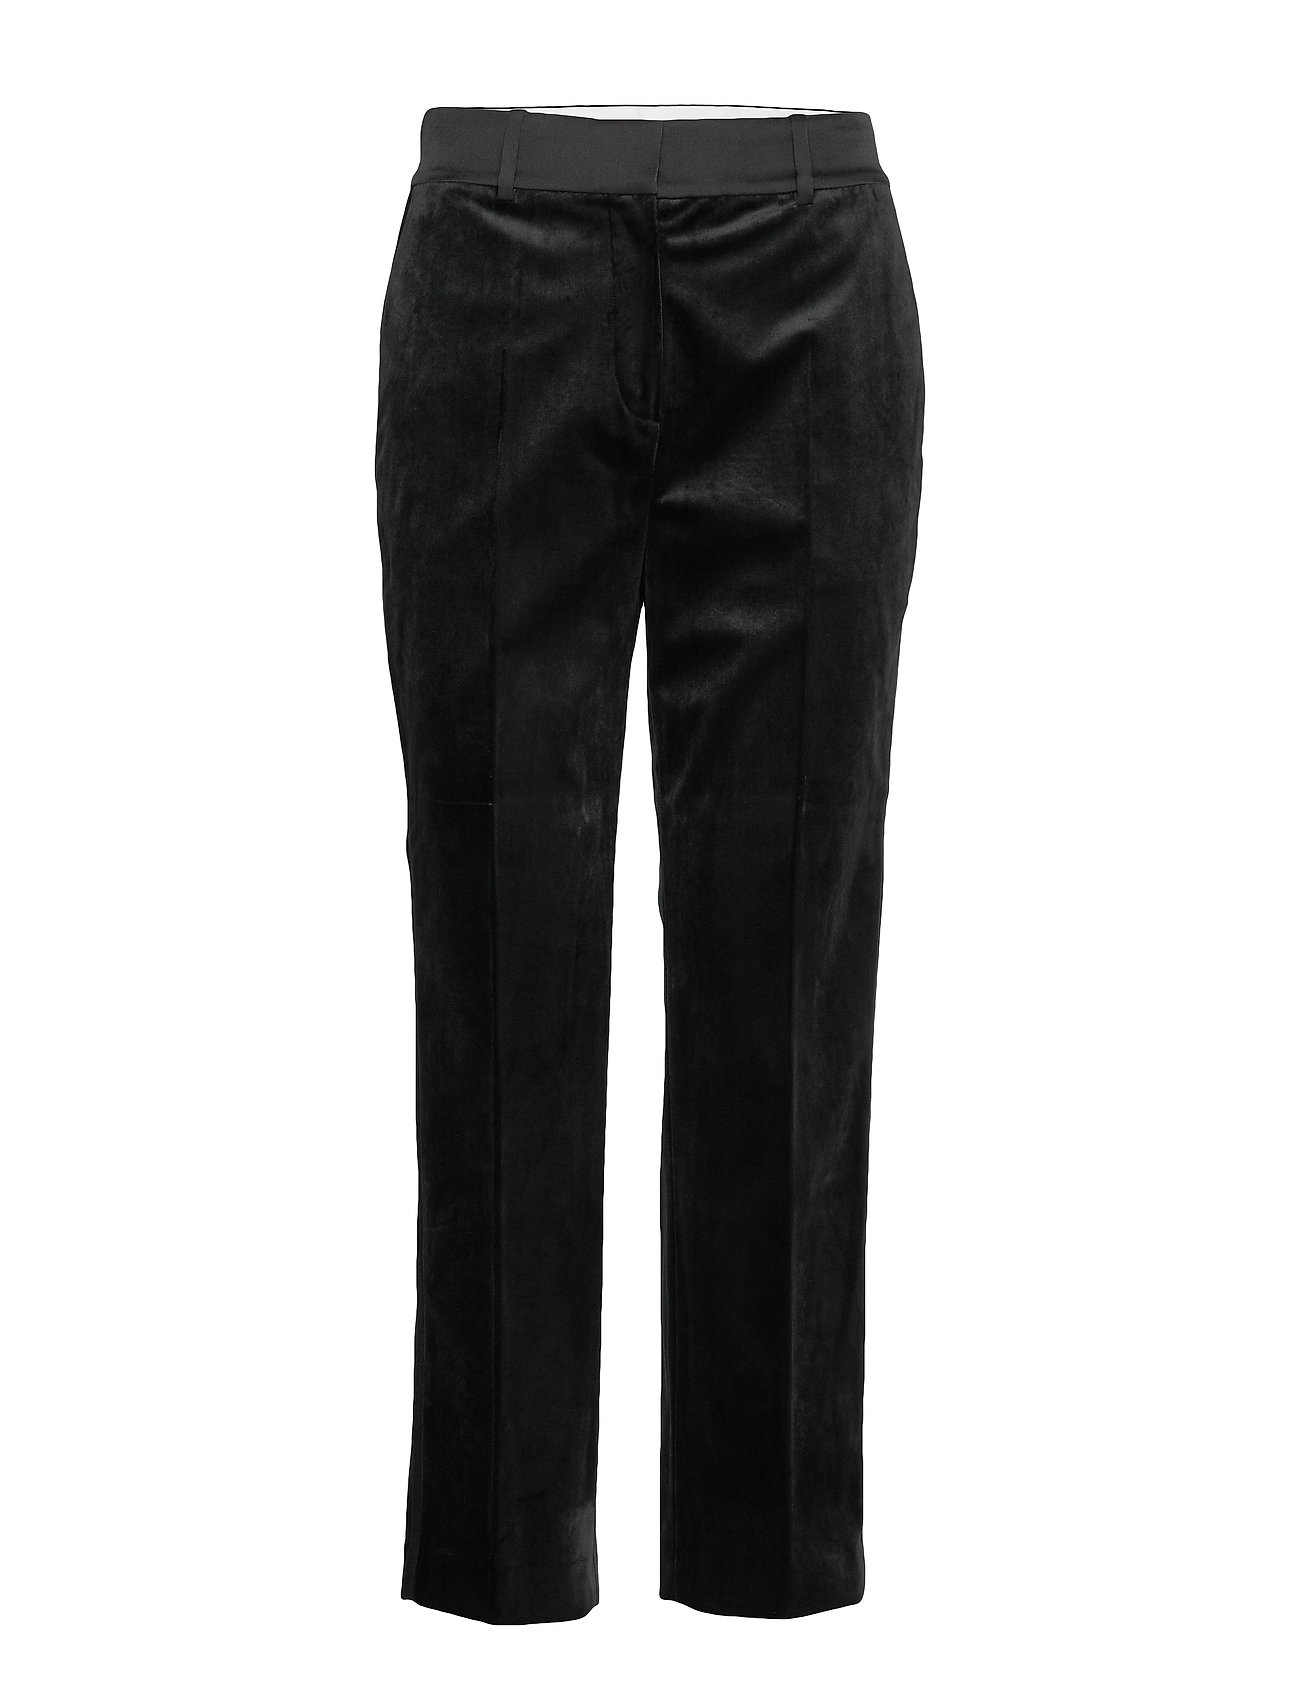 Tommy Hilfiger TERESA STRAIGHT PANT - BLACK